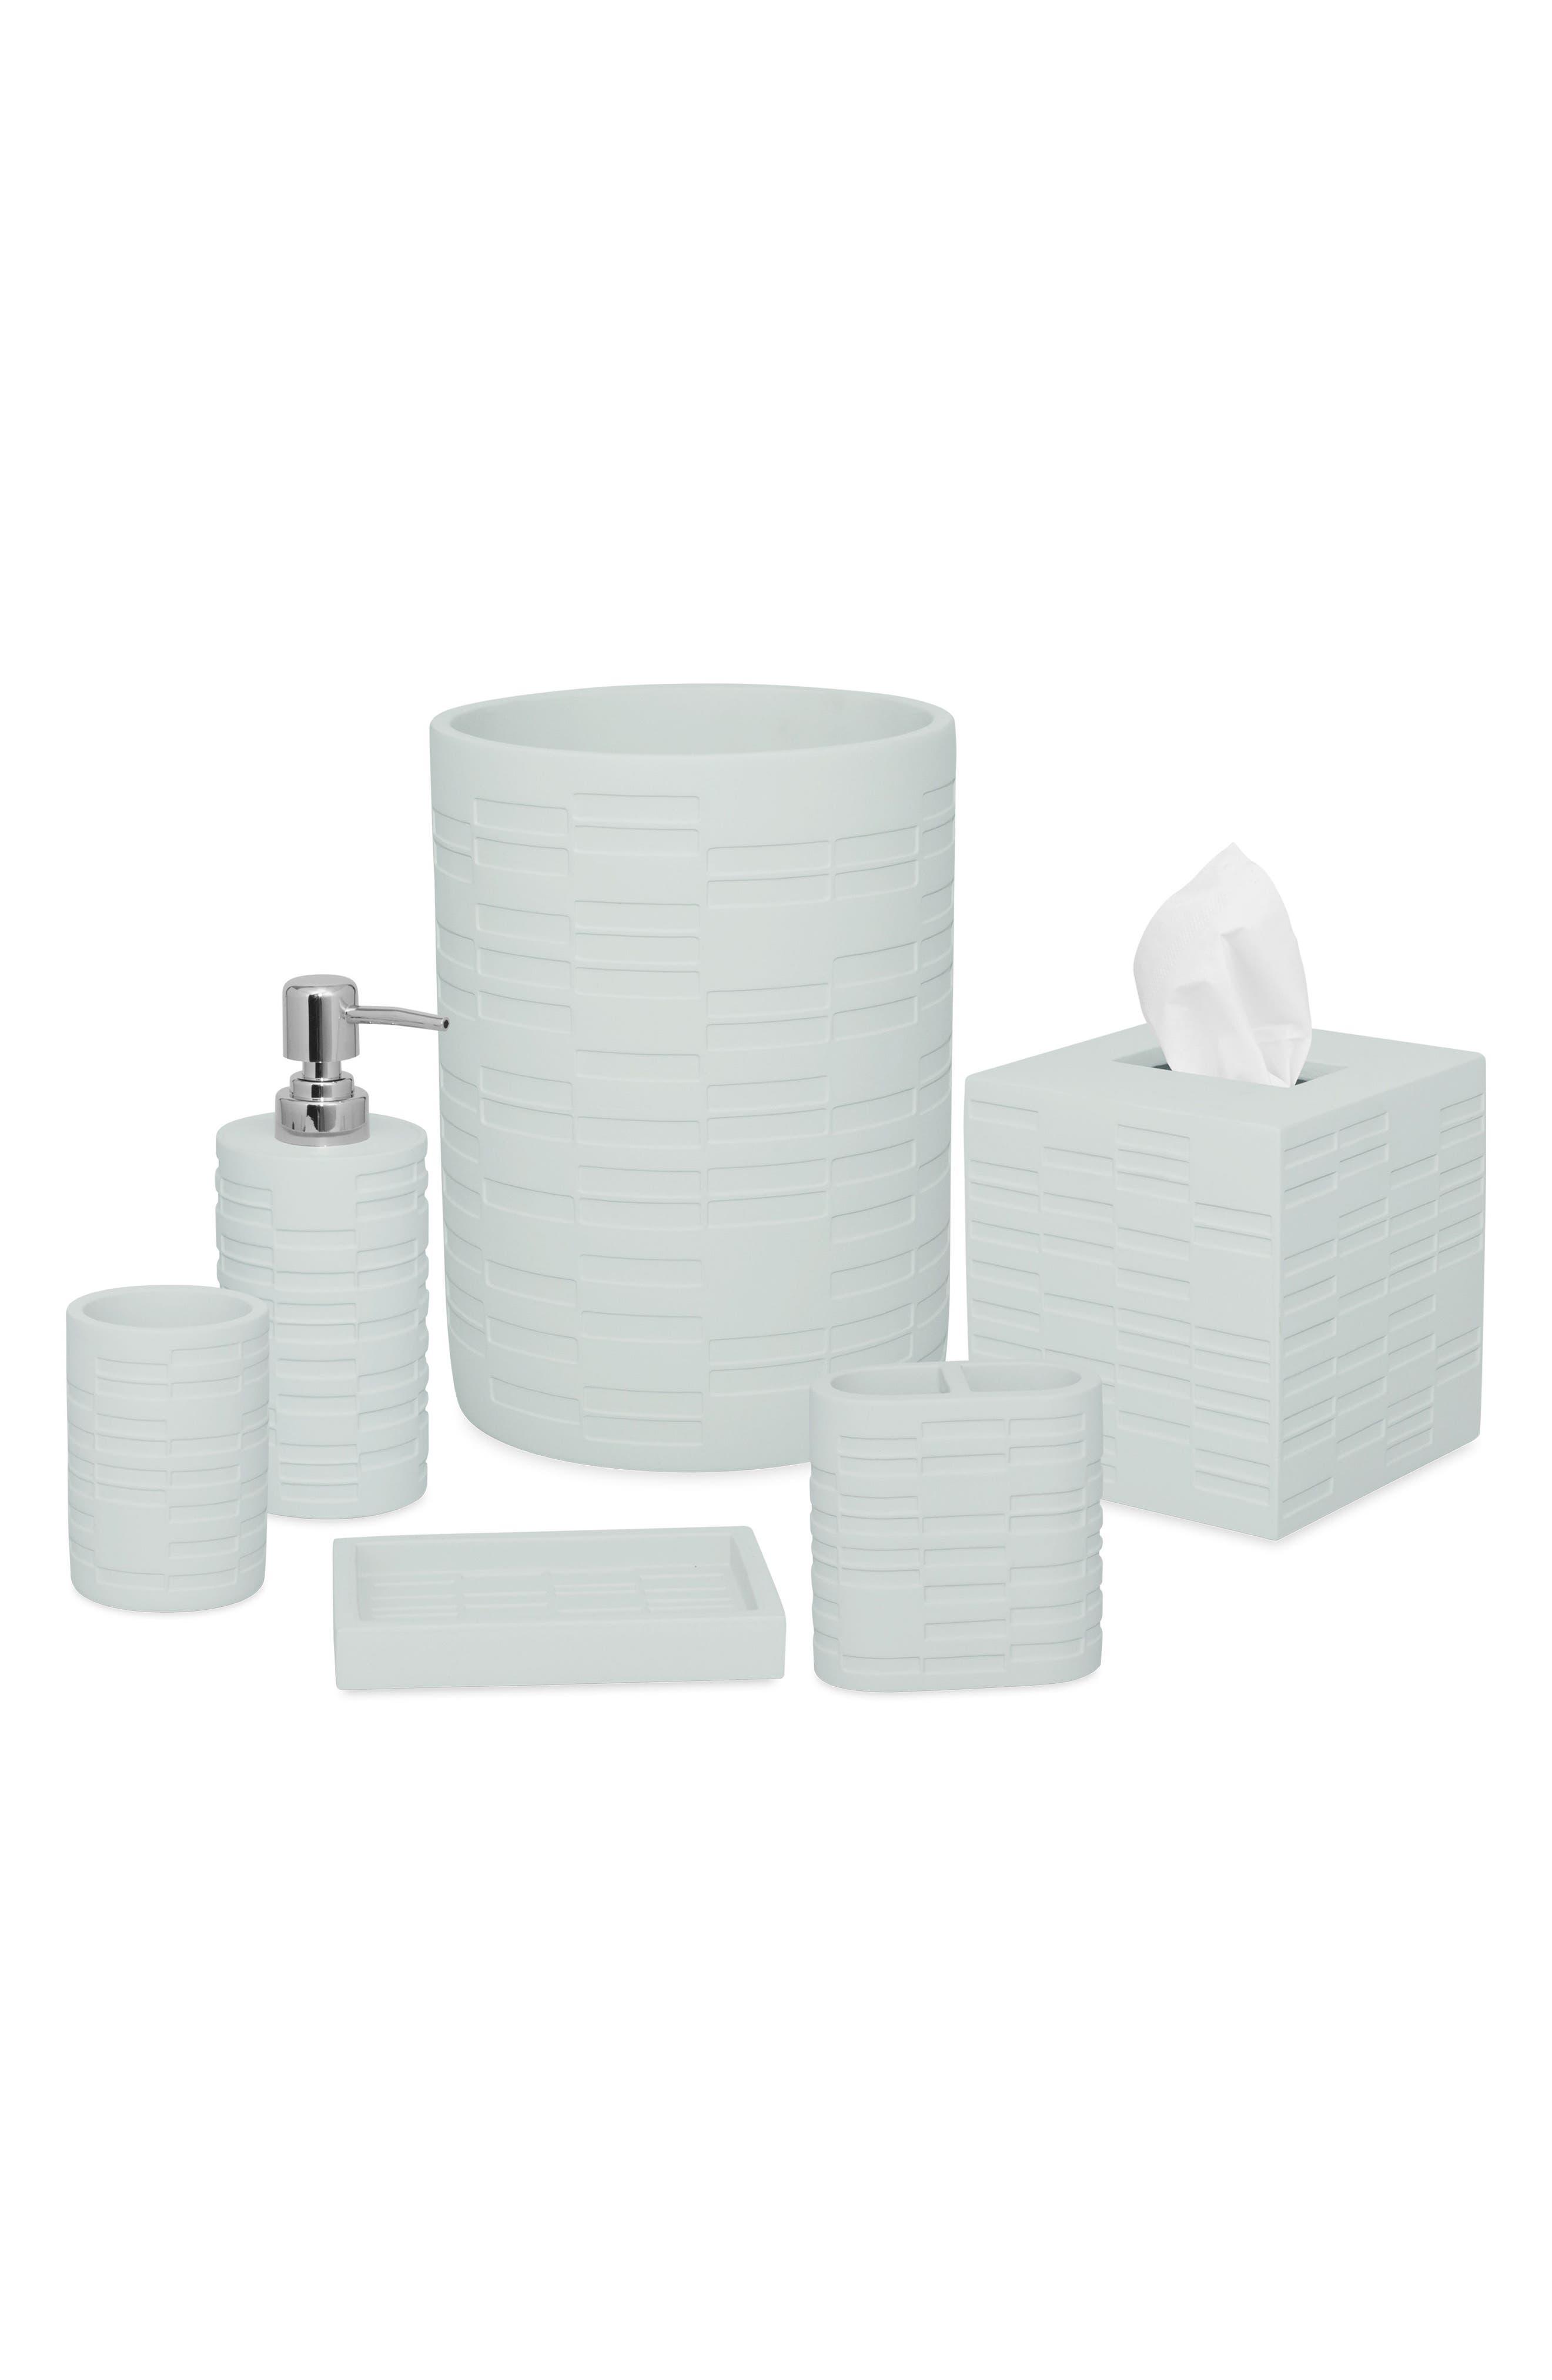 Alternate Image 2  - DKNY High Rise Tissue Box Cover